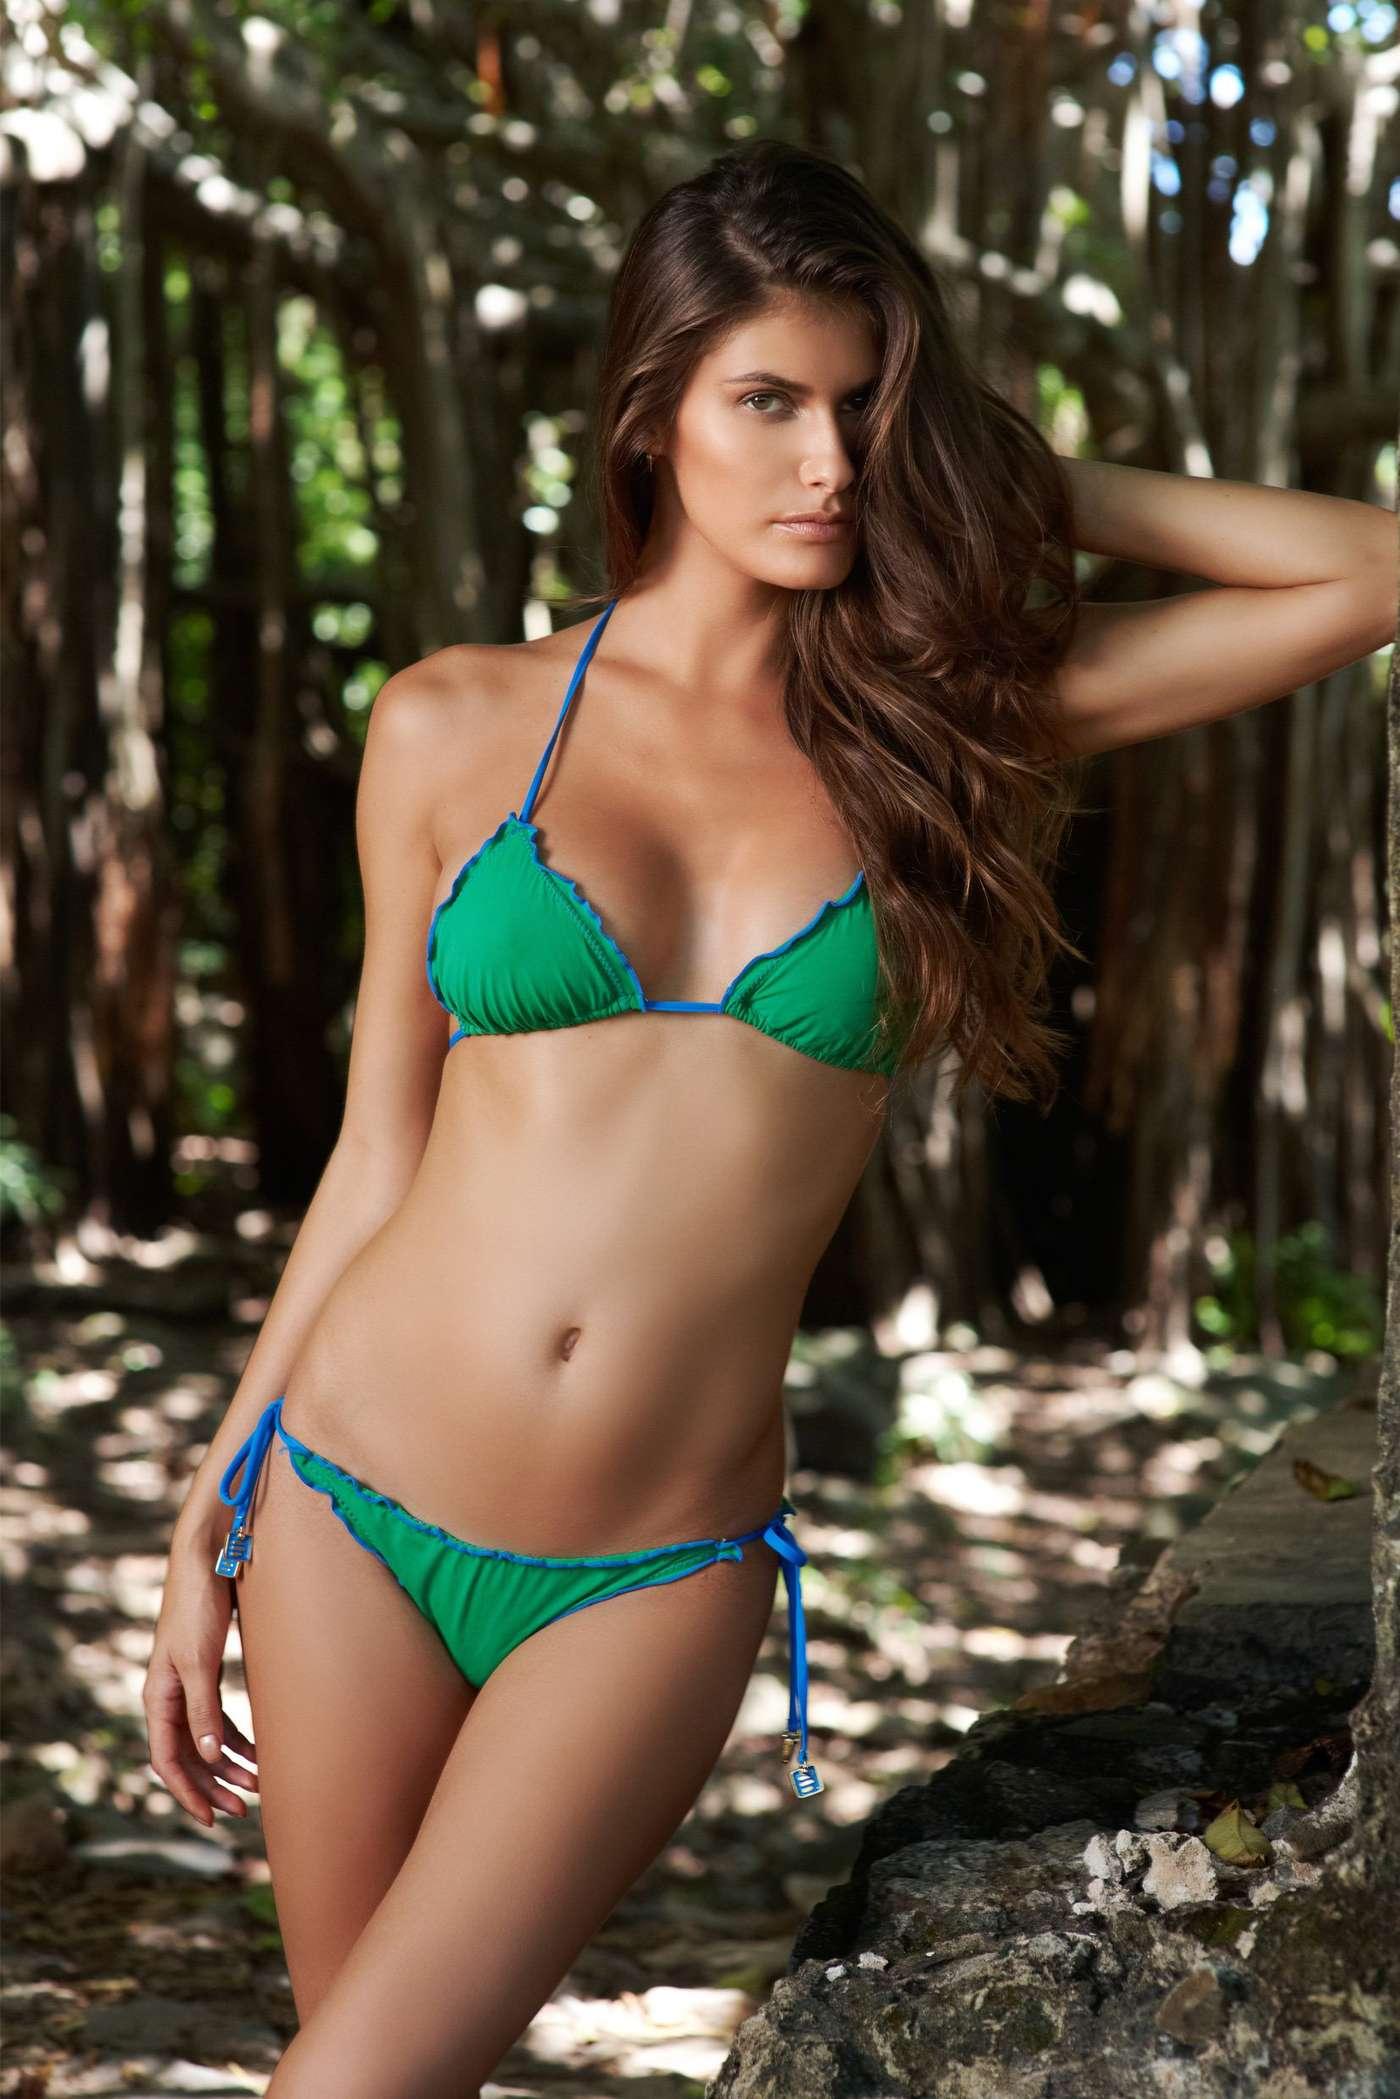 bikini-international-model-naked-female-hoes